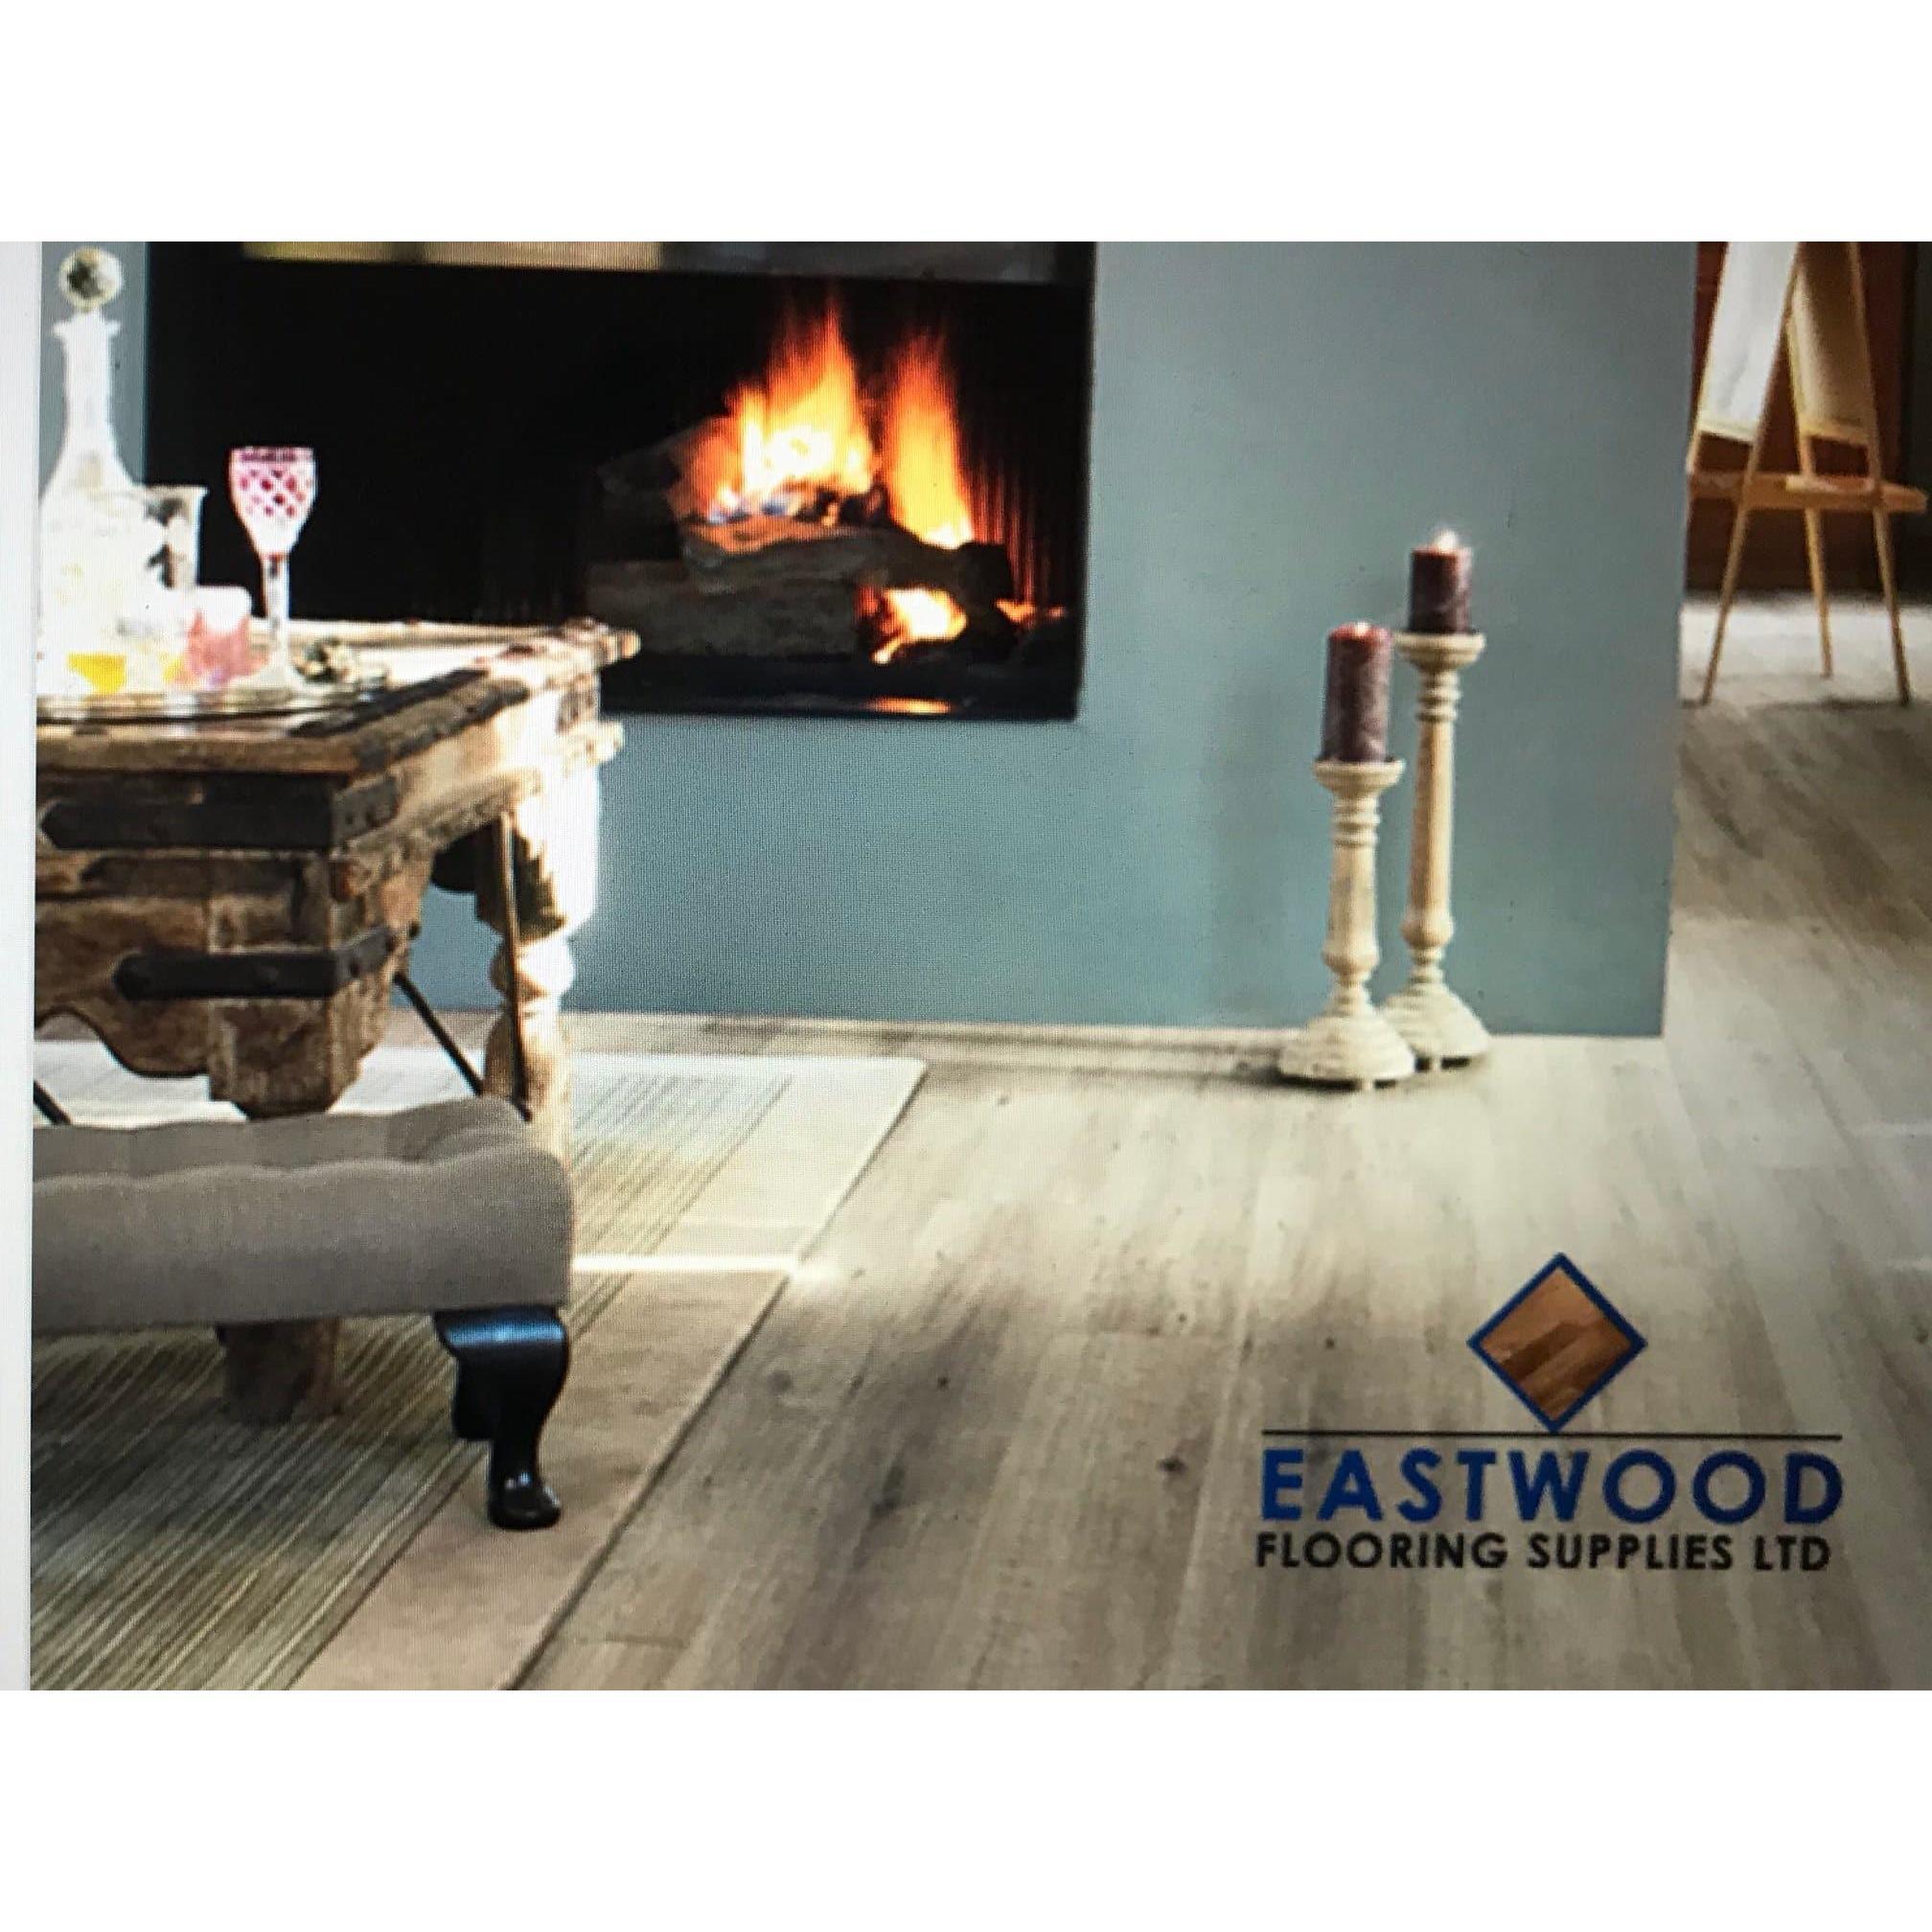 Eastwood Flooring Supplies Ltd